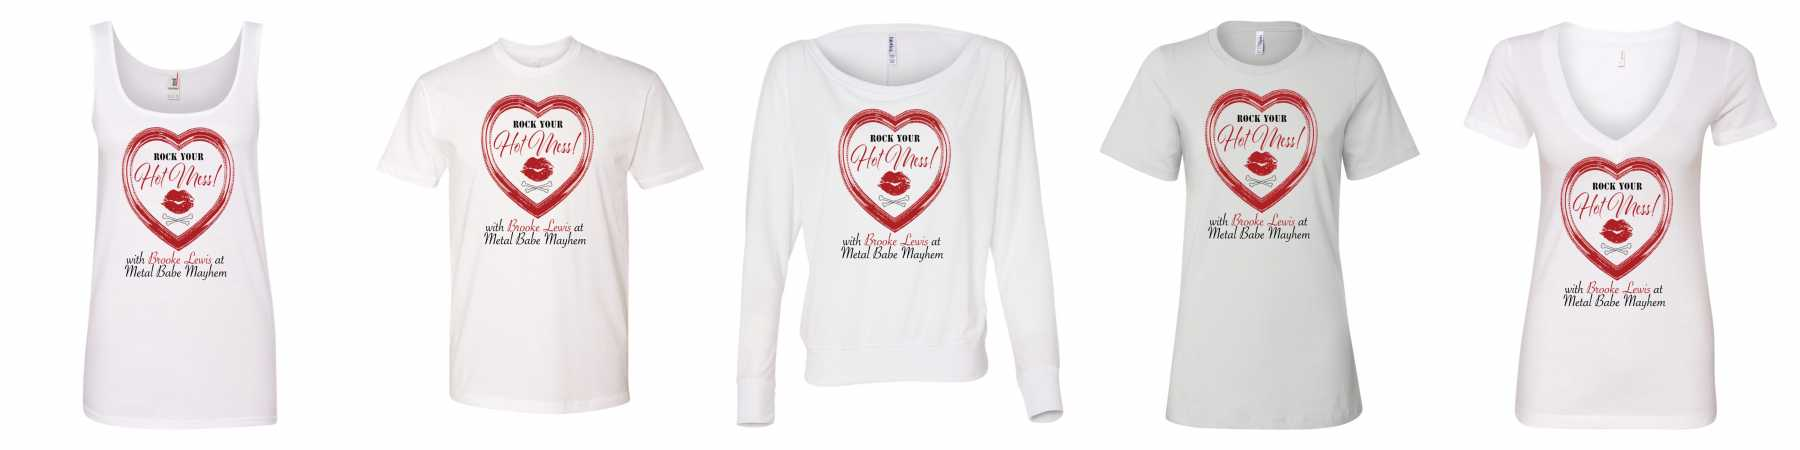 Brooke Lewis & Metal Babe Mayhem Creates New Clothing Line | Brooke Lewis